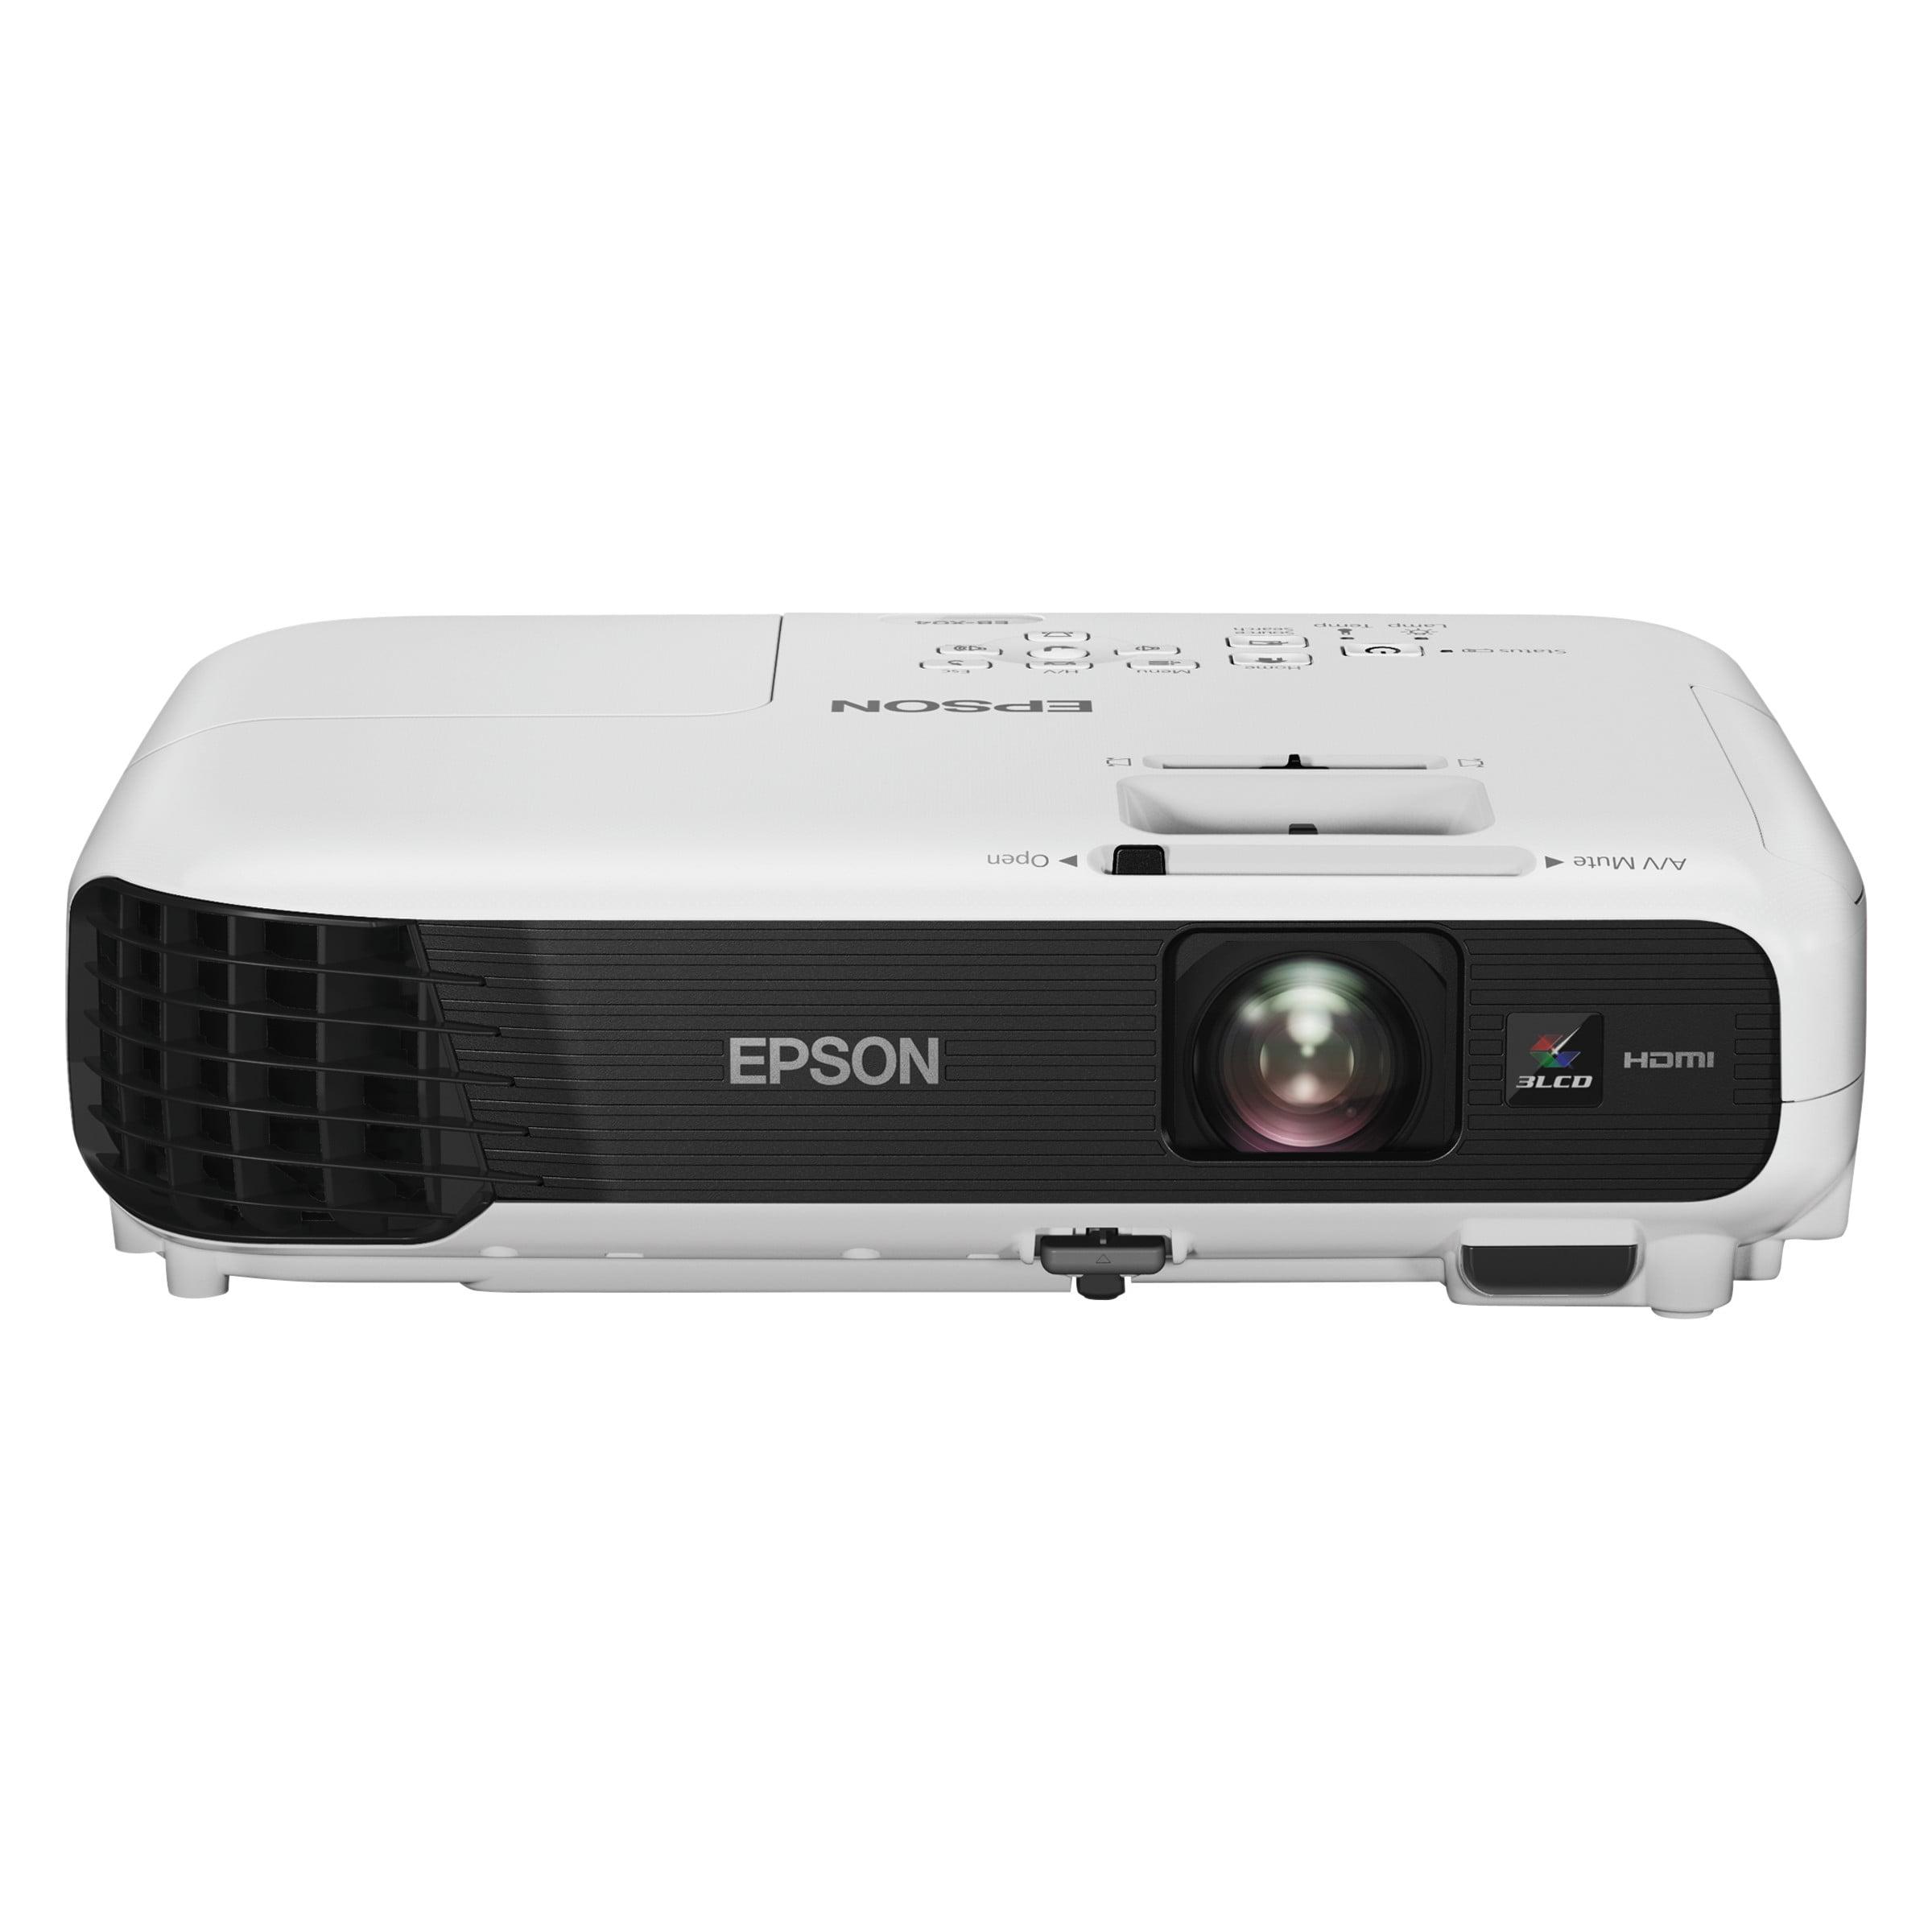 Epson VS340 XGA 3LCD Projector, 2800 Lumens, 1024 x 768 Pixels, 1.2x Zoom by EPSON AMERICA, INC.